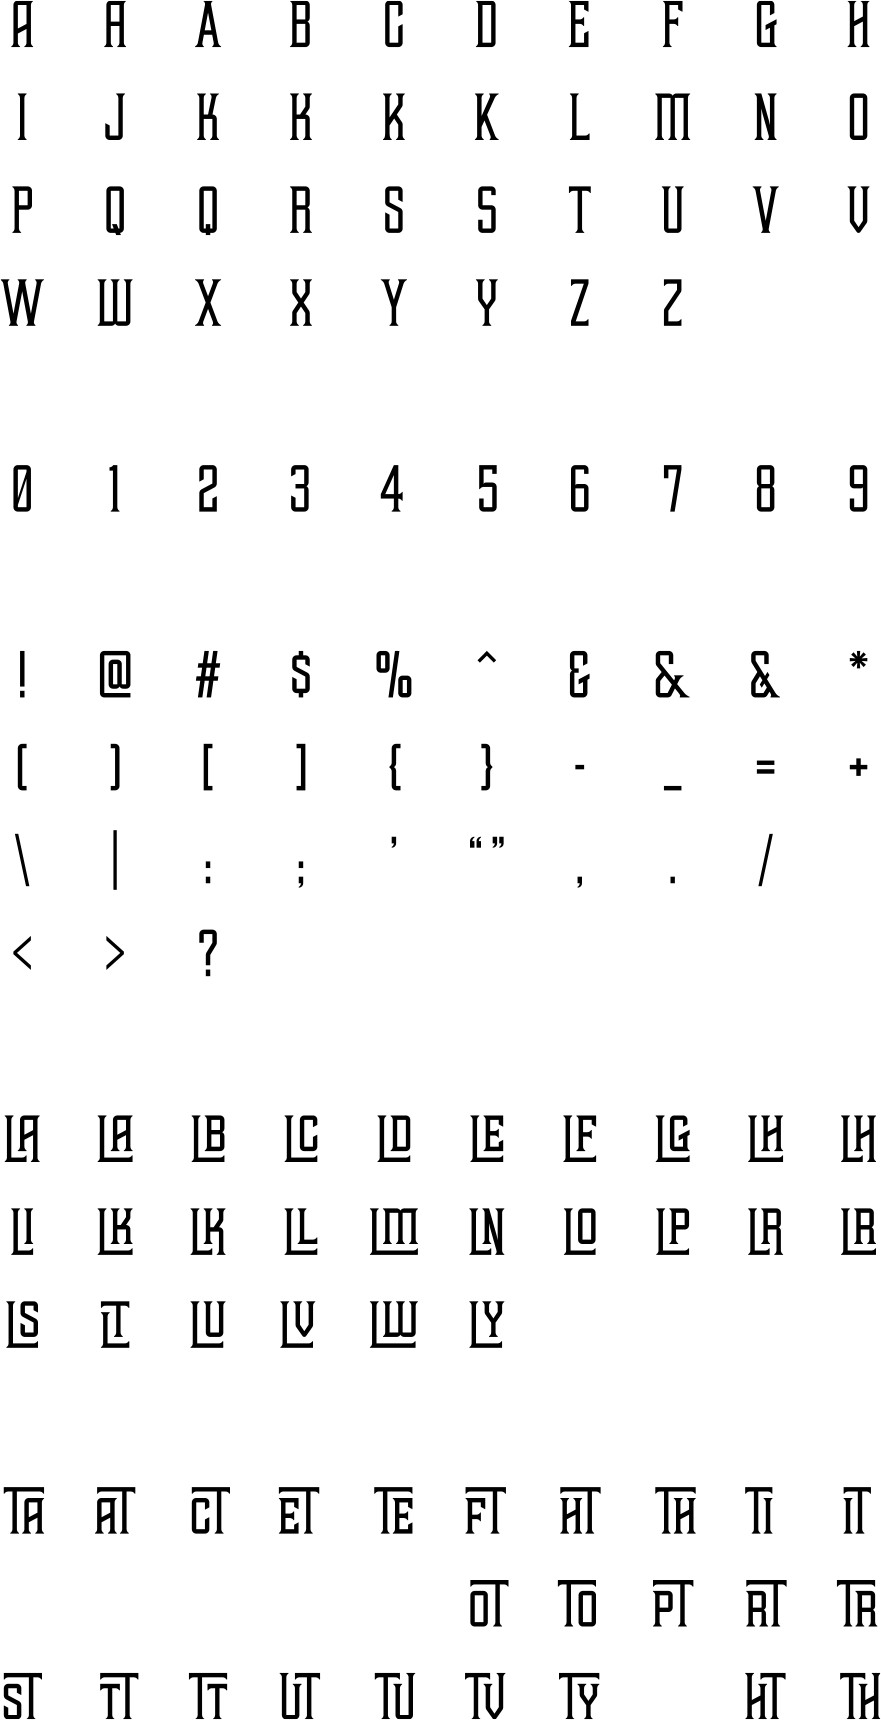 tehaus-glyphs